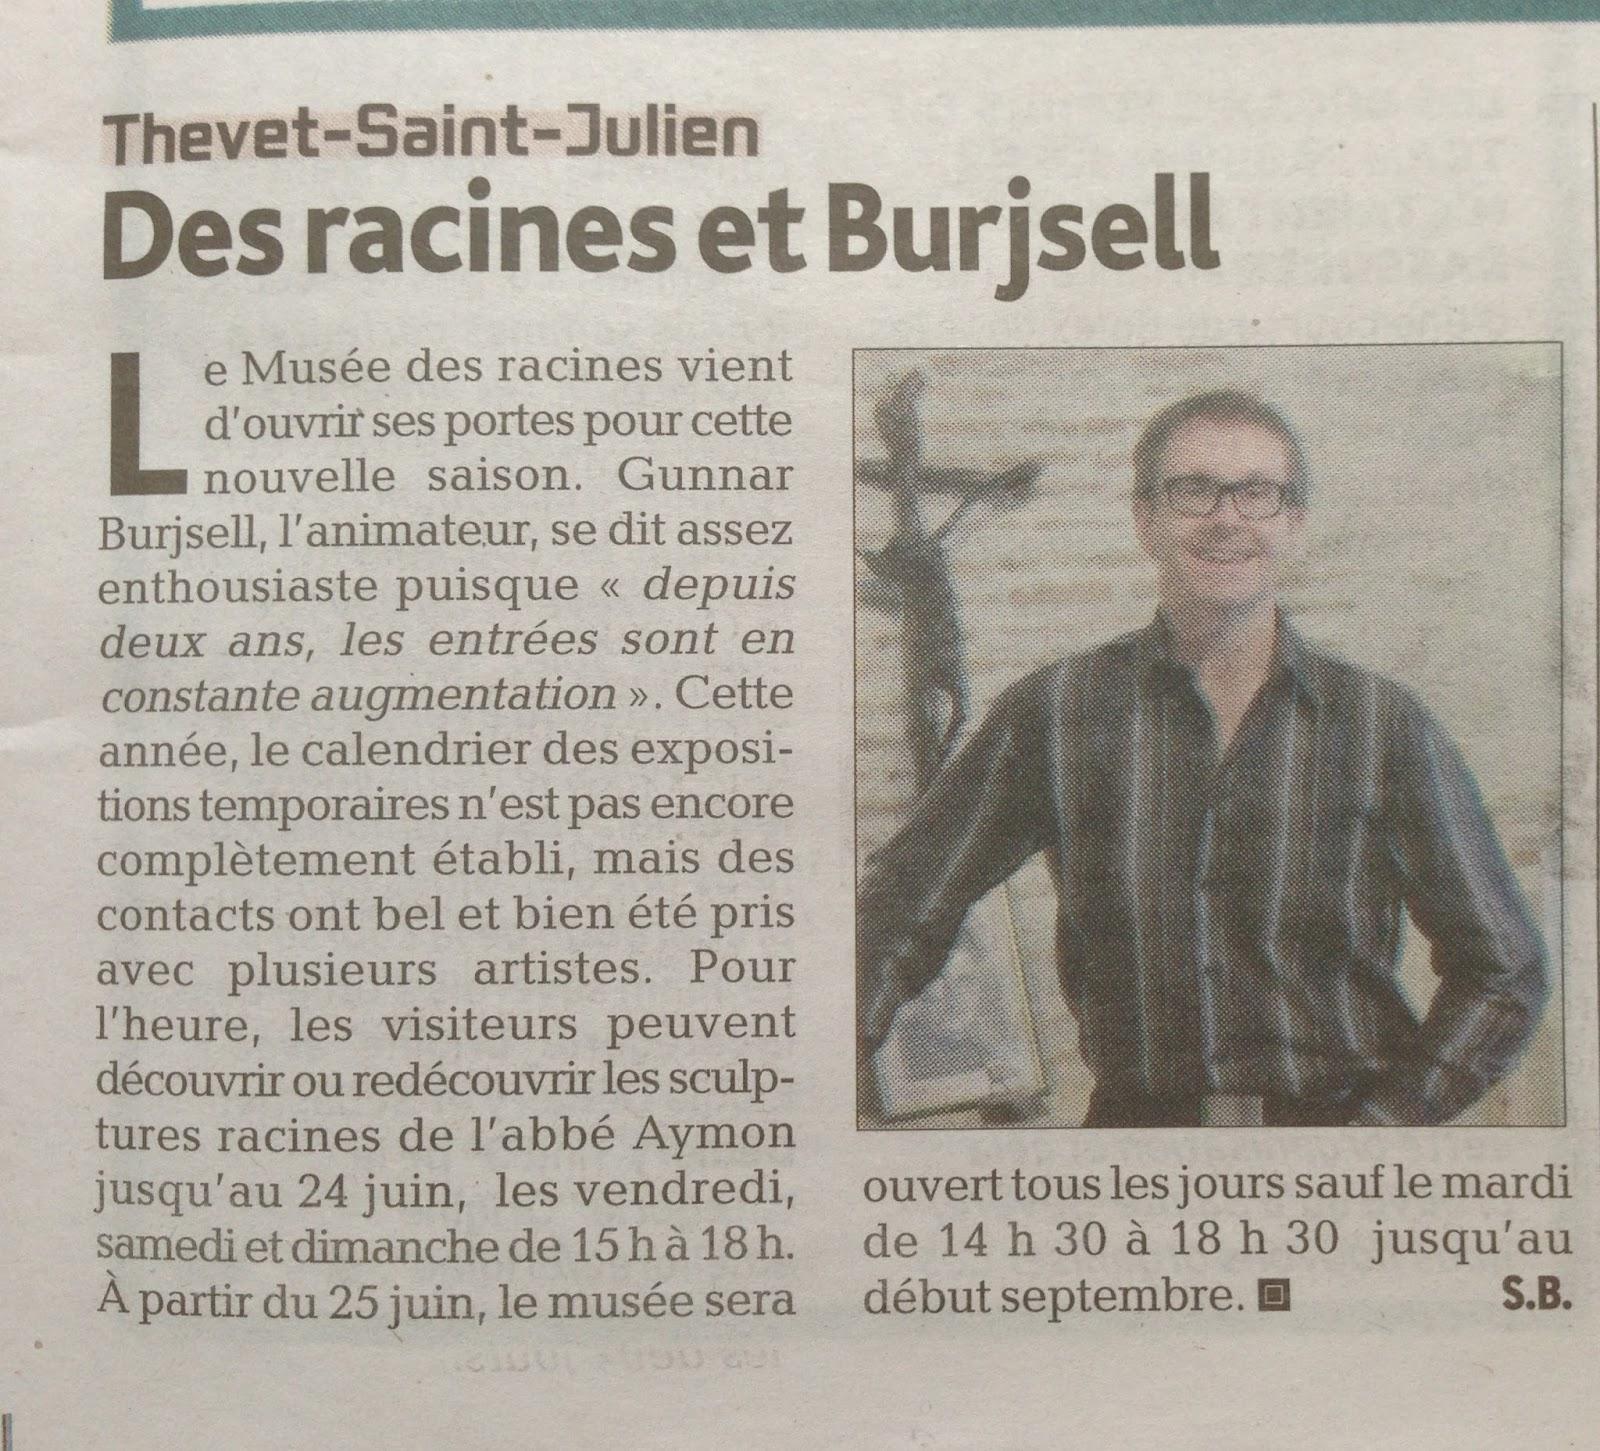 gunnar bjursell u0026 39 s blog  la r u00e9ouverture du mus u00e9e des